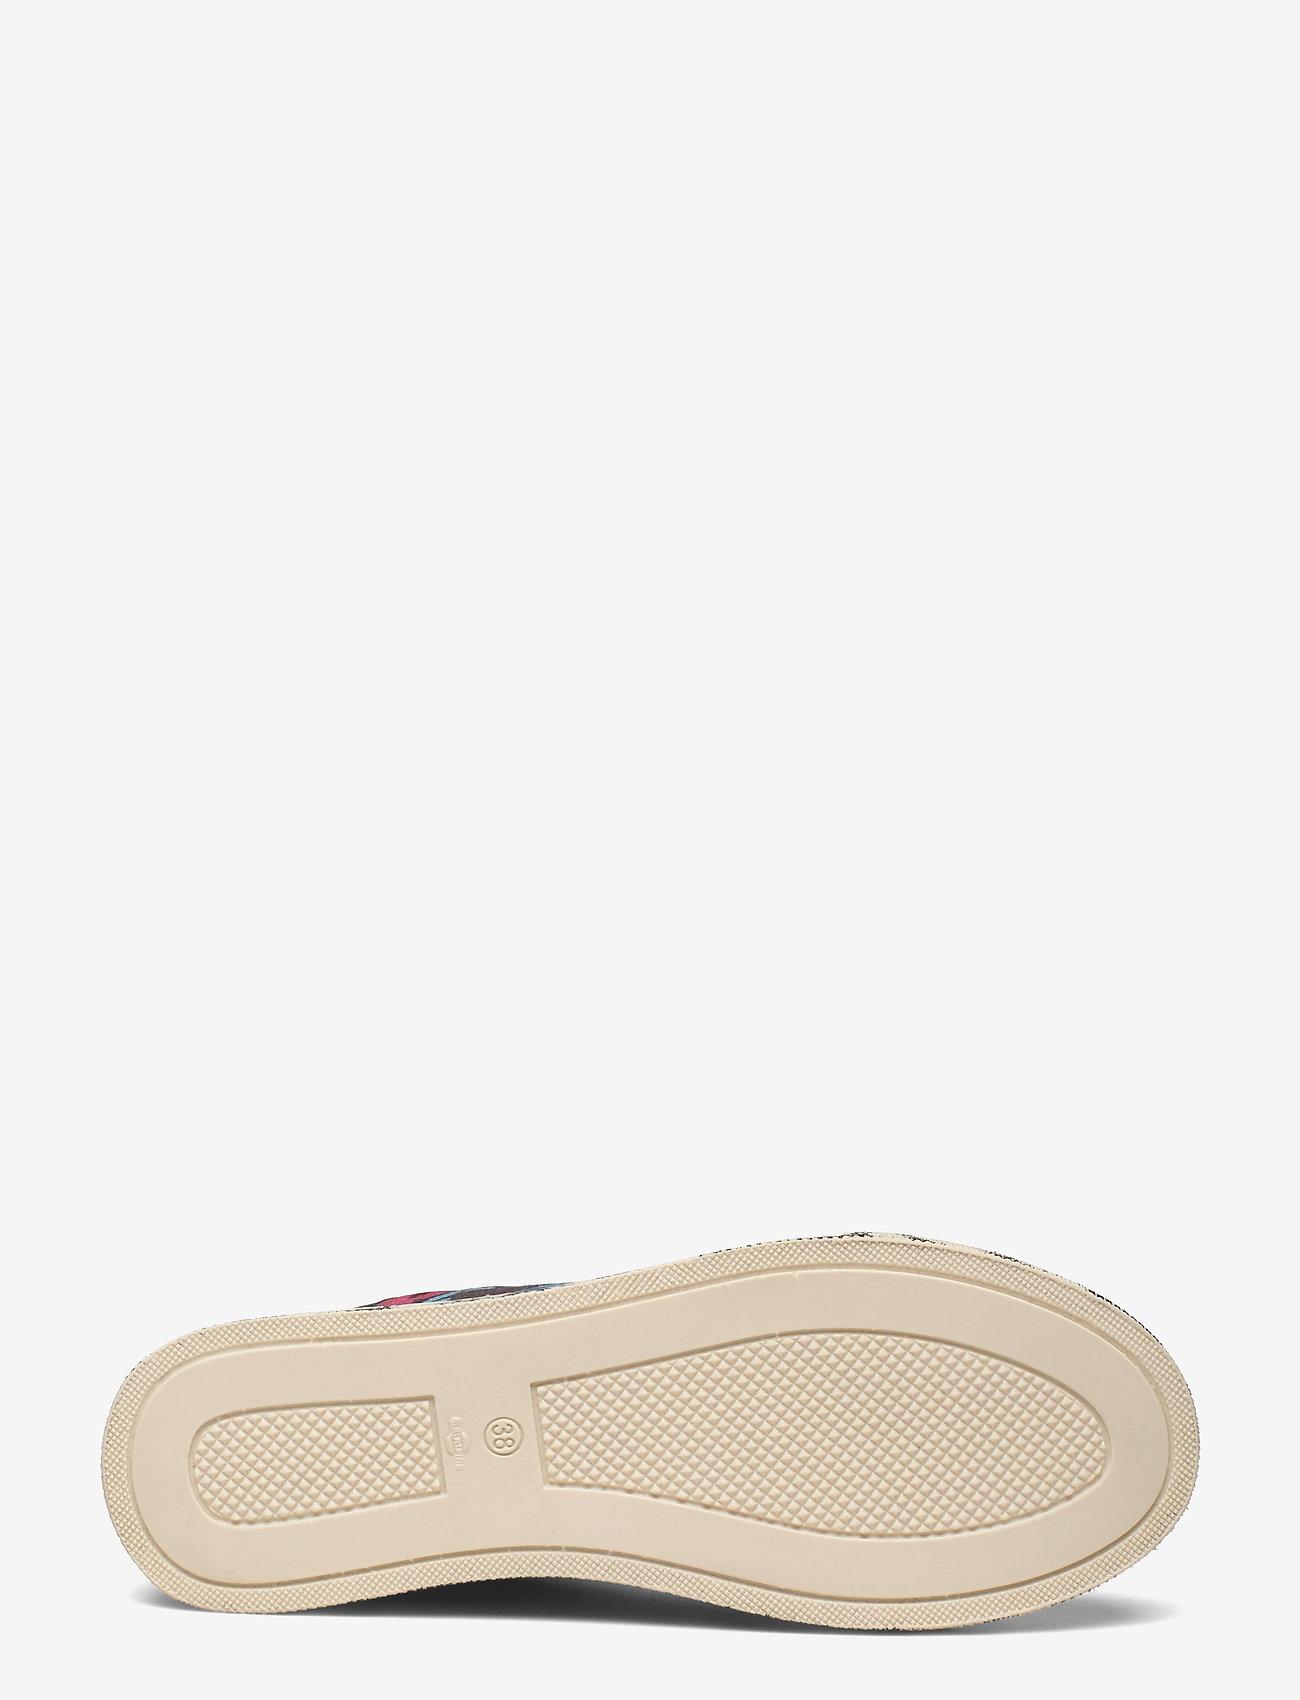 STINE GOYA - Zita, 1192 Cotton Canvas Sneakers - lage sneakers - 60s allover - 4